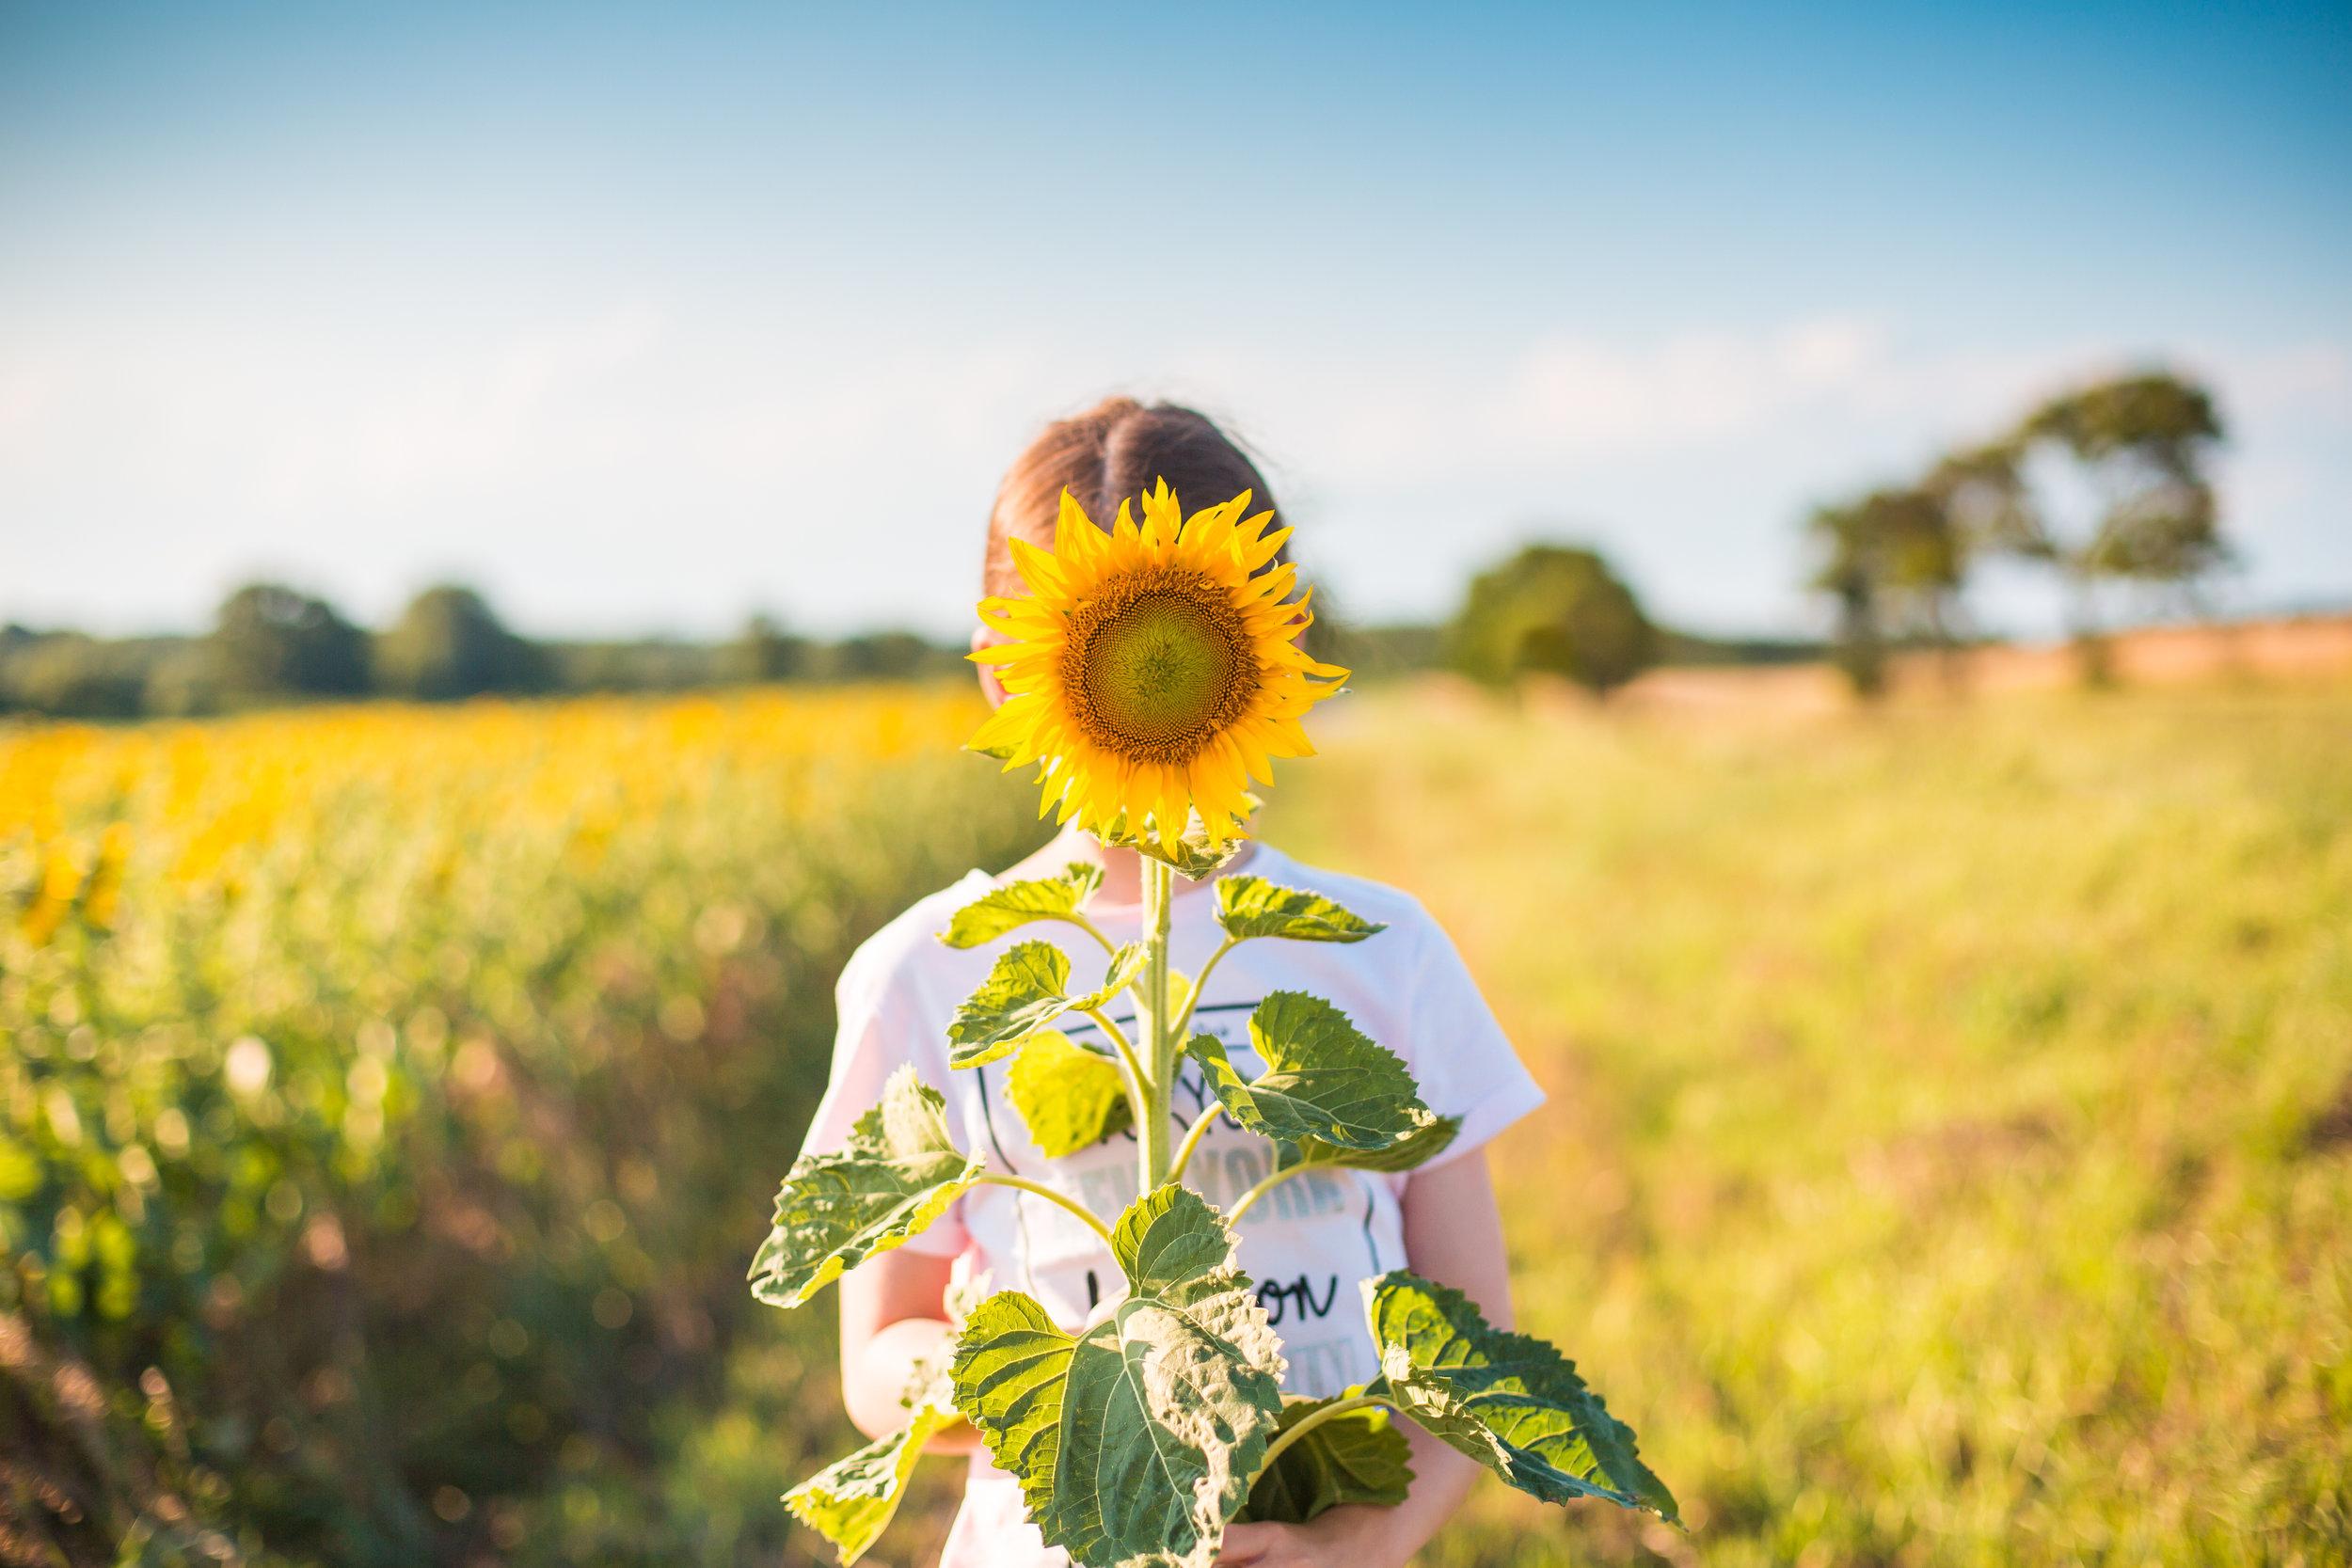 little-girl-with-sunflower-in-a-sunflower-field-picjumbo-com.jpg